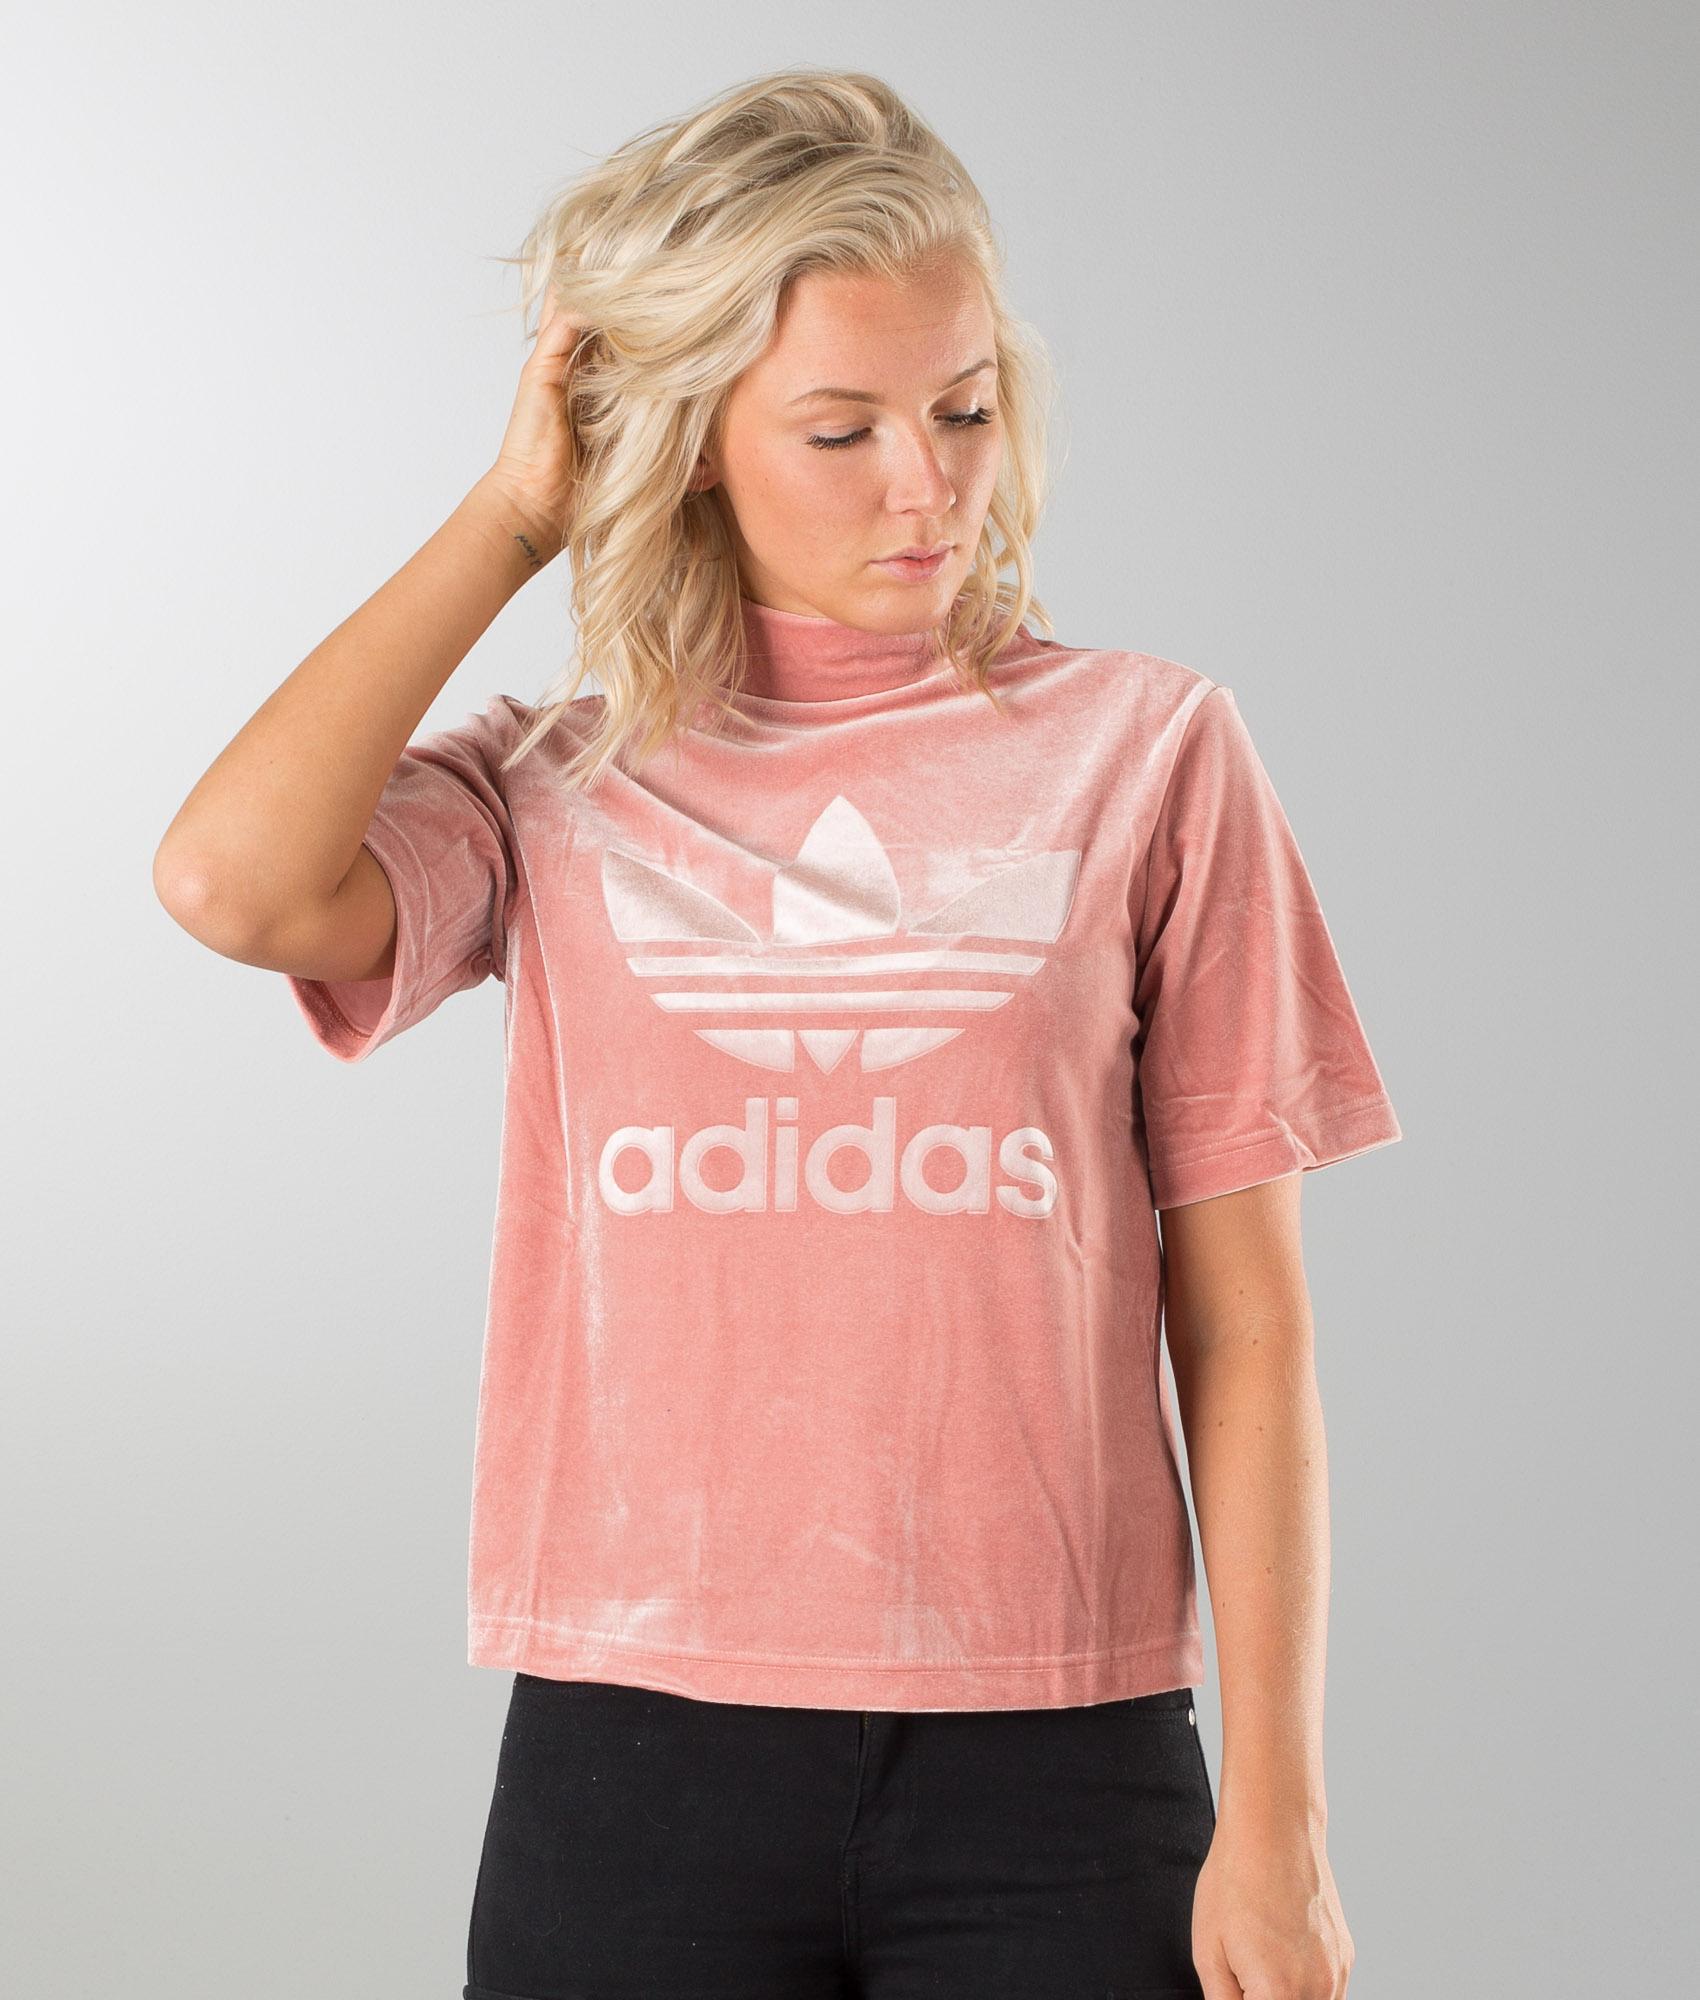 Adidas Originals Velvet Vibes High Neck Boxy T Shirt Rawpin